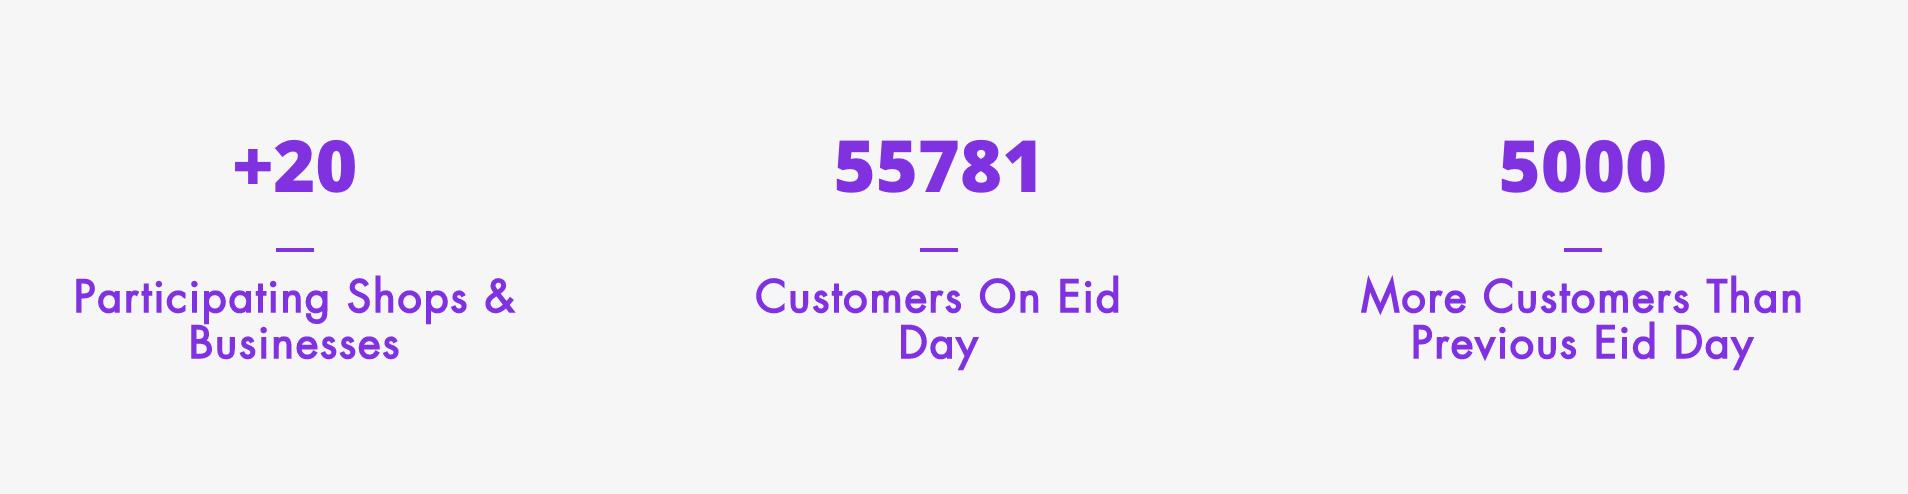 Itis Ramadan Campaign results